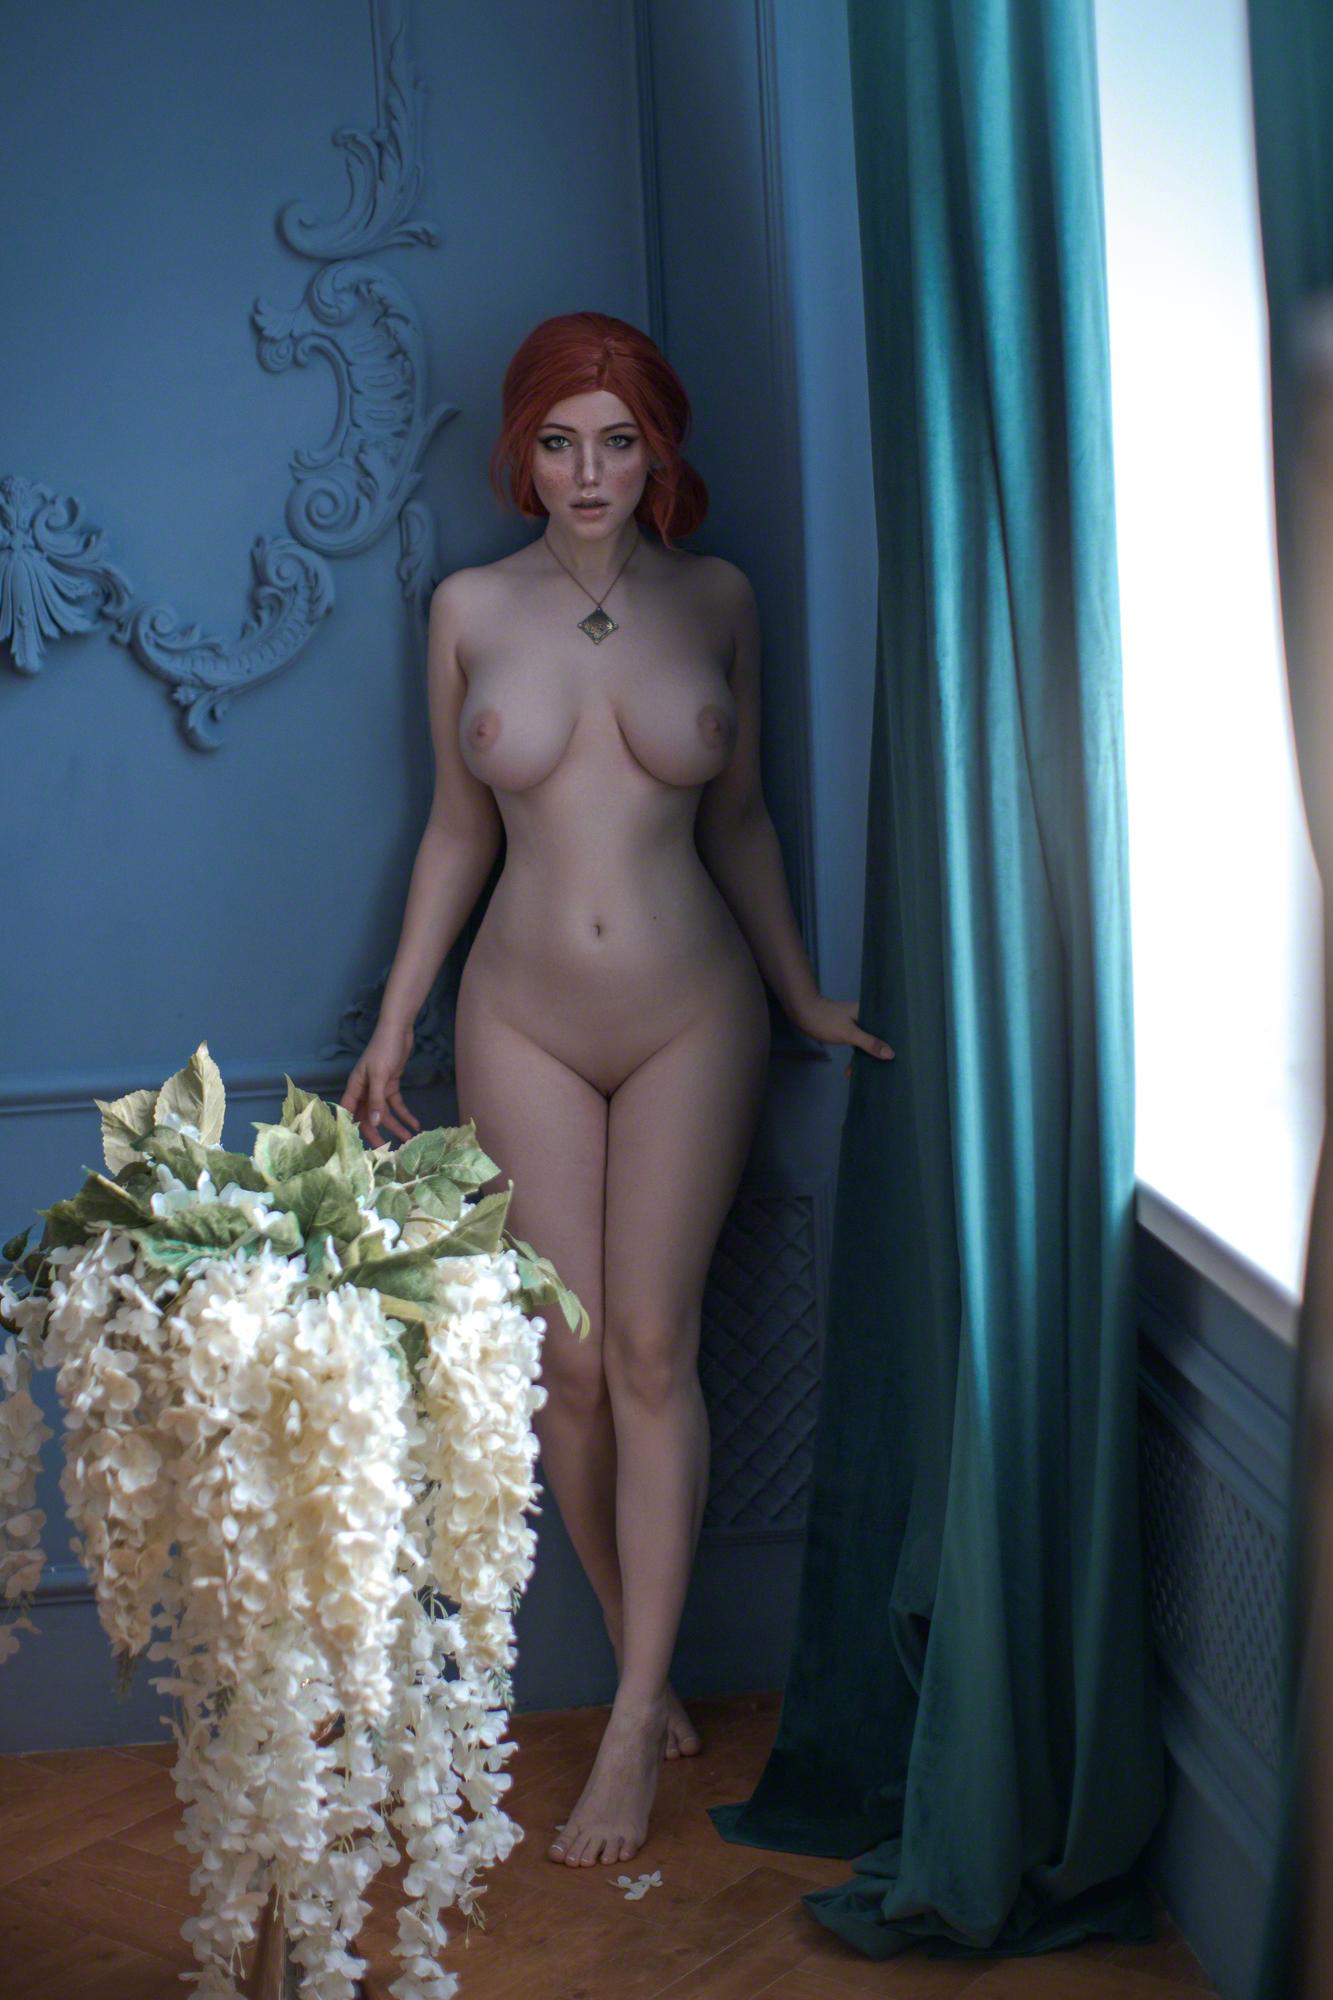 Leaked Nude Set From Lada Lyumos Patreon 0039